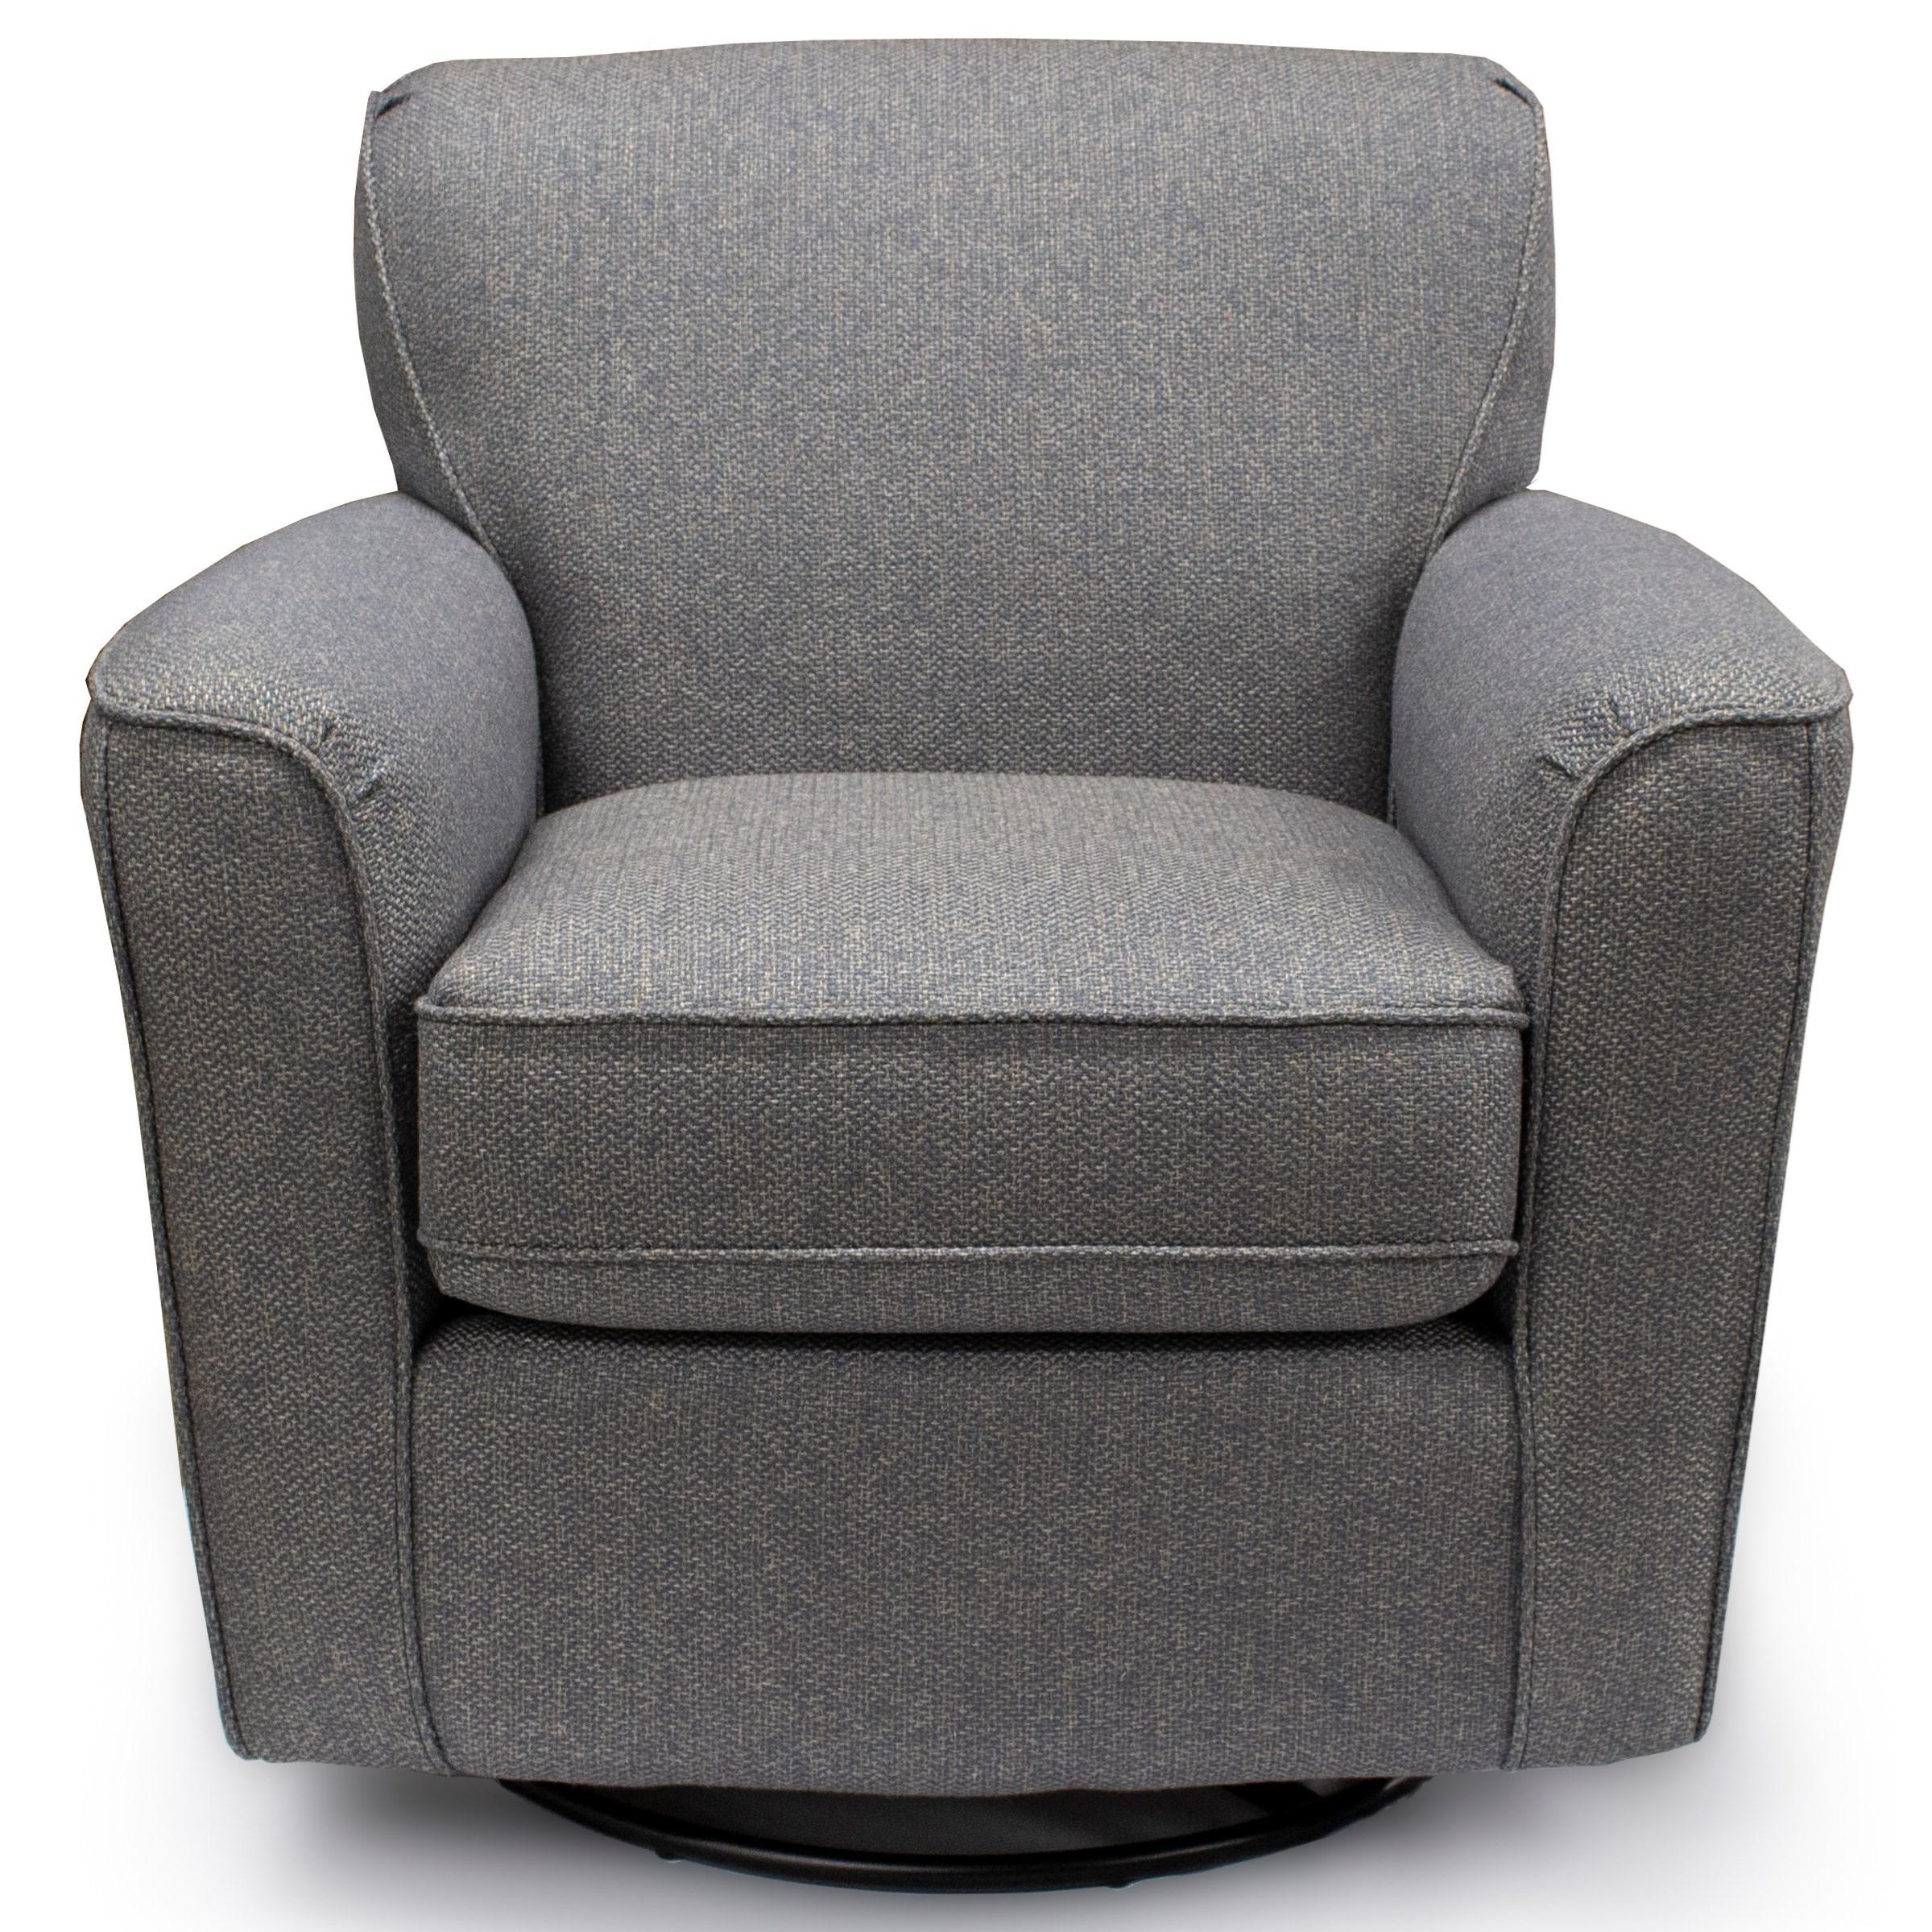 Vendor 411 Swivel Glide Chairs 2887 Kaylee Swivel Barrel